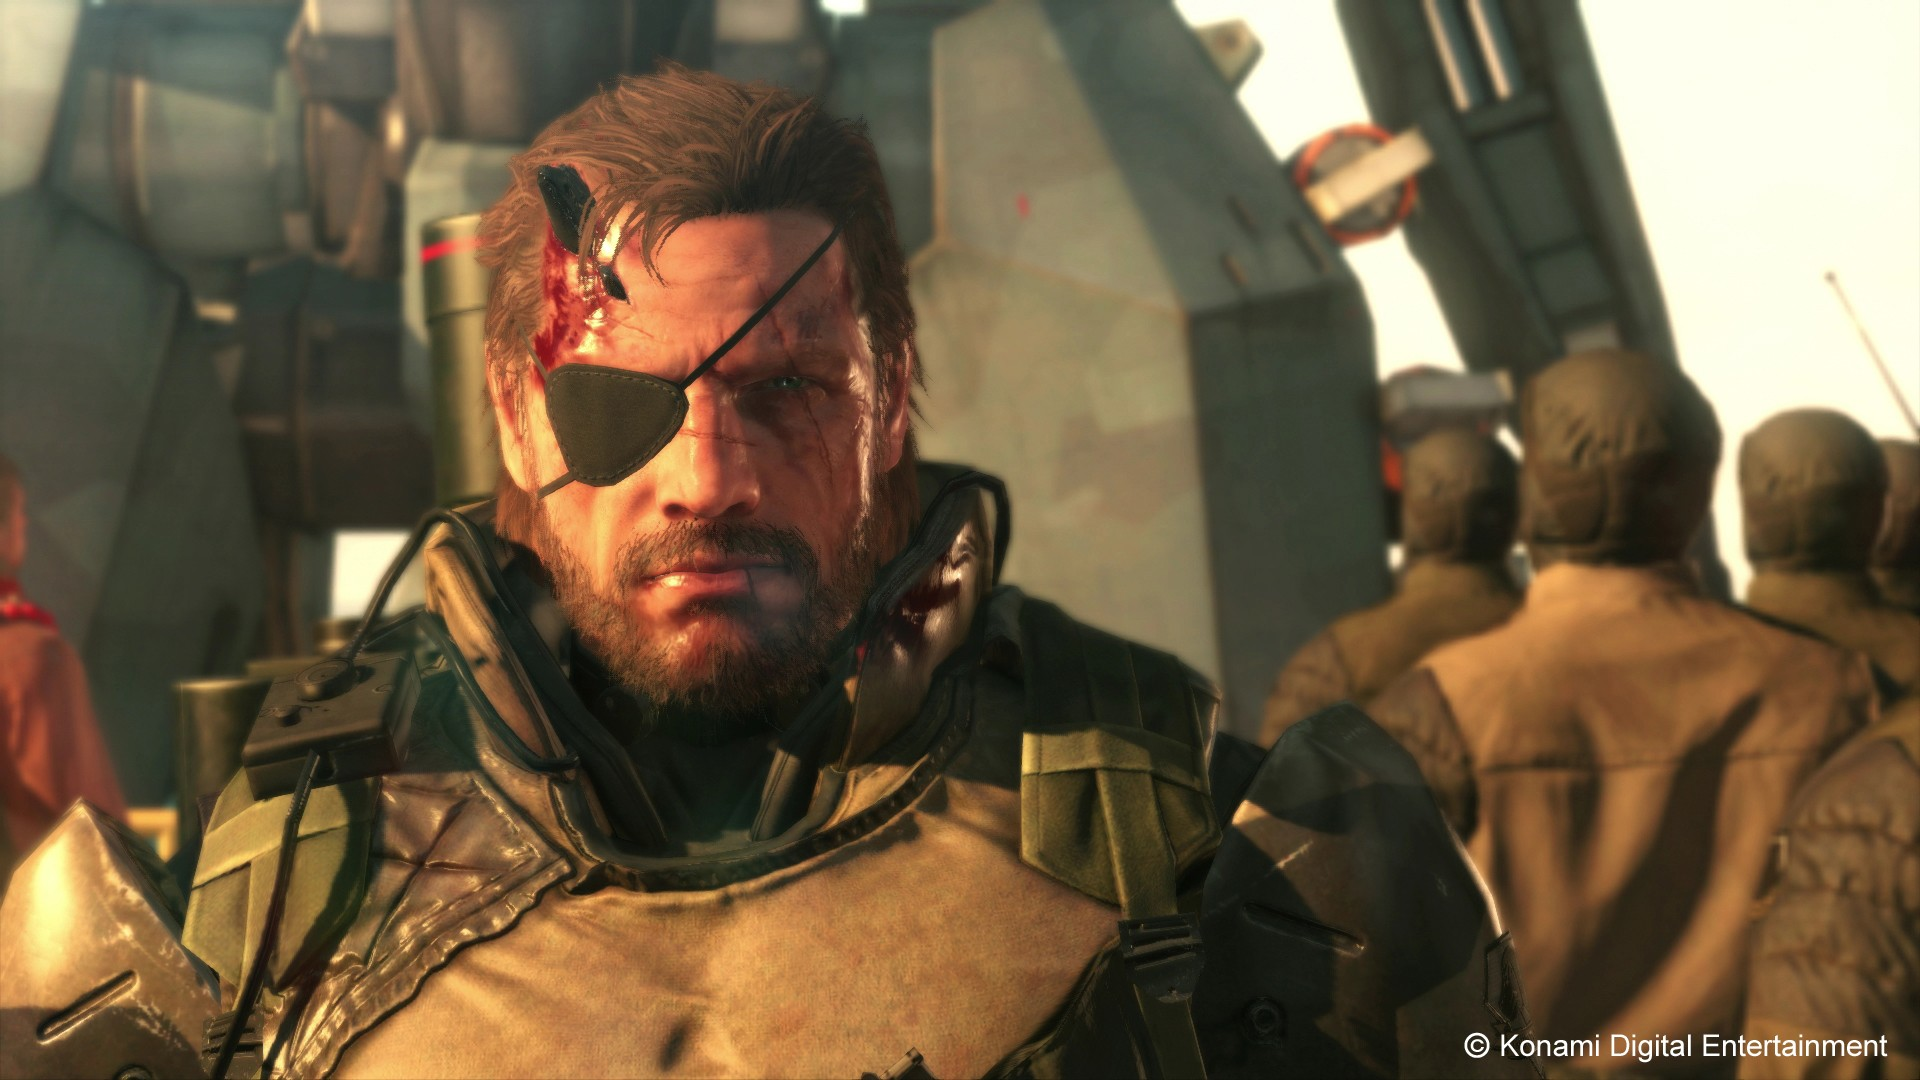 Скриншот  4 - Metal Gear Solid V:The Phantom Pain STEAM KEY СКАН